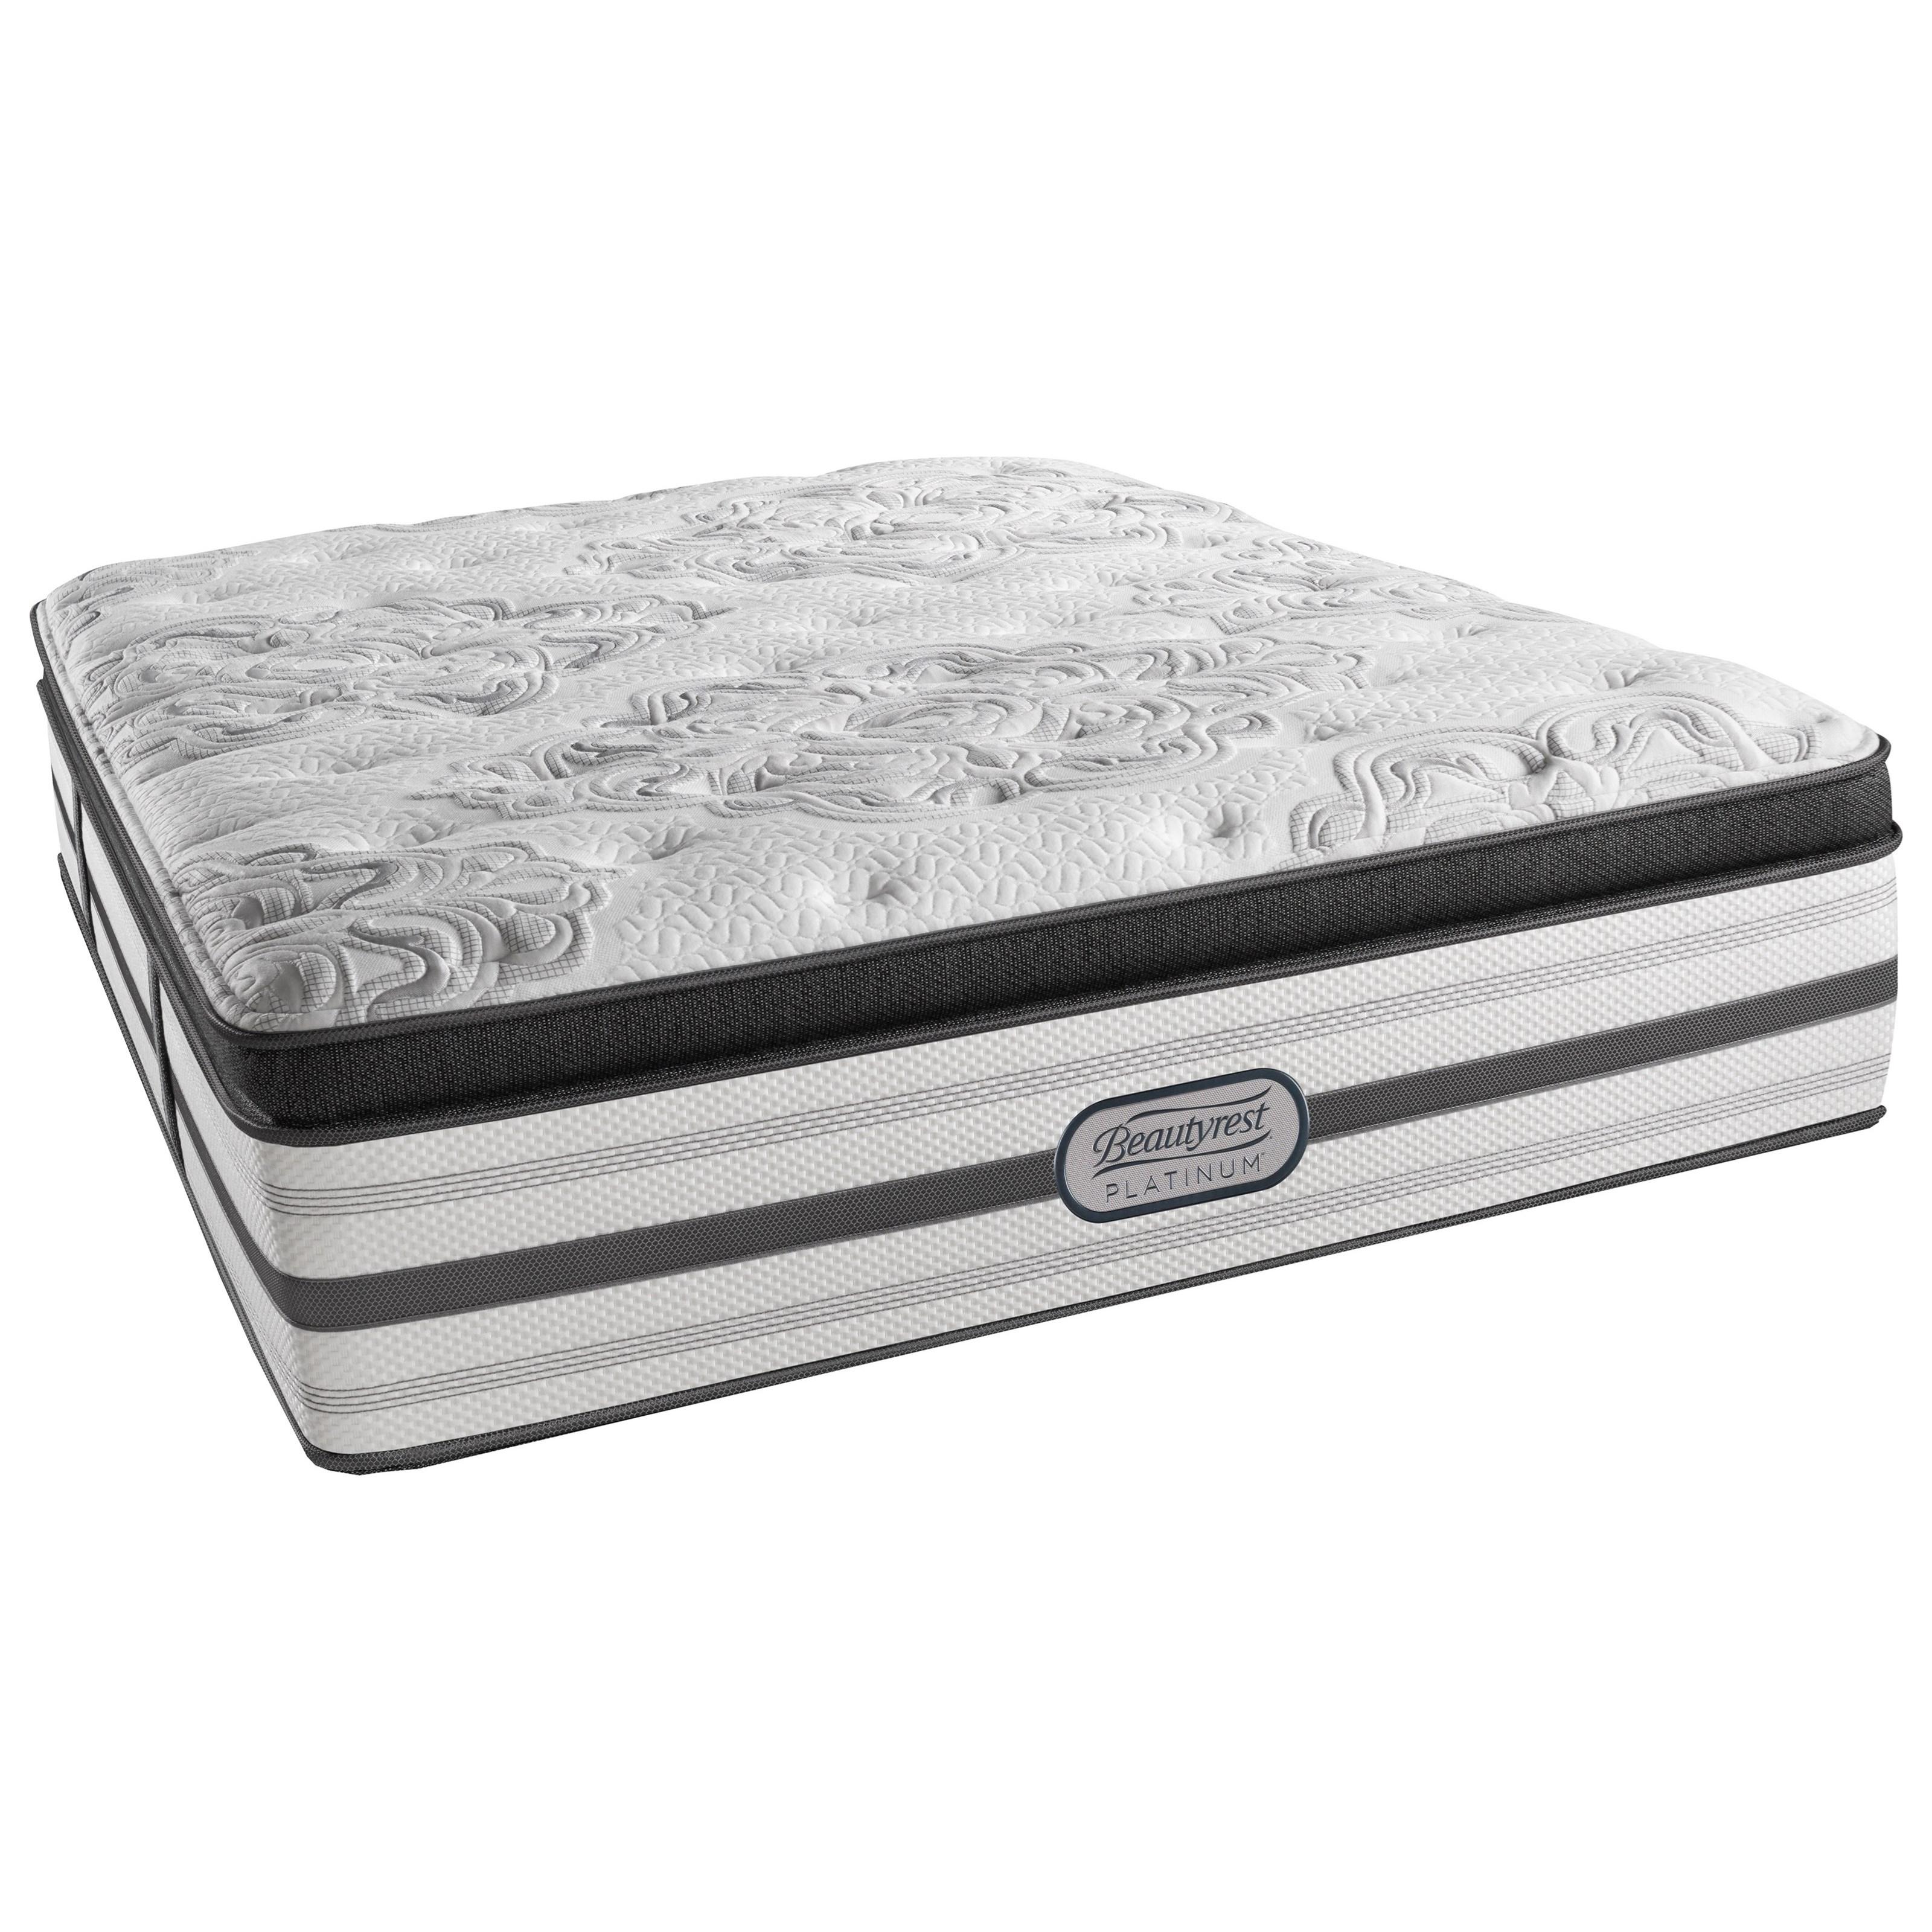 "Beautyrest Platinum Katherine Twin XL Luxury Firm Box PT 16 1/2"" Mattress - Item Number: LV4LFBT-TXL"